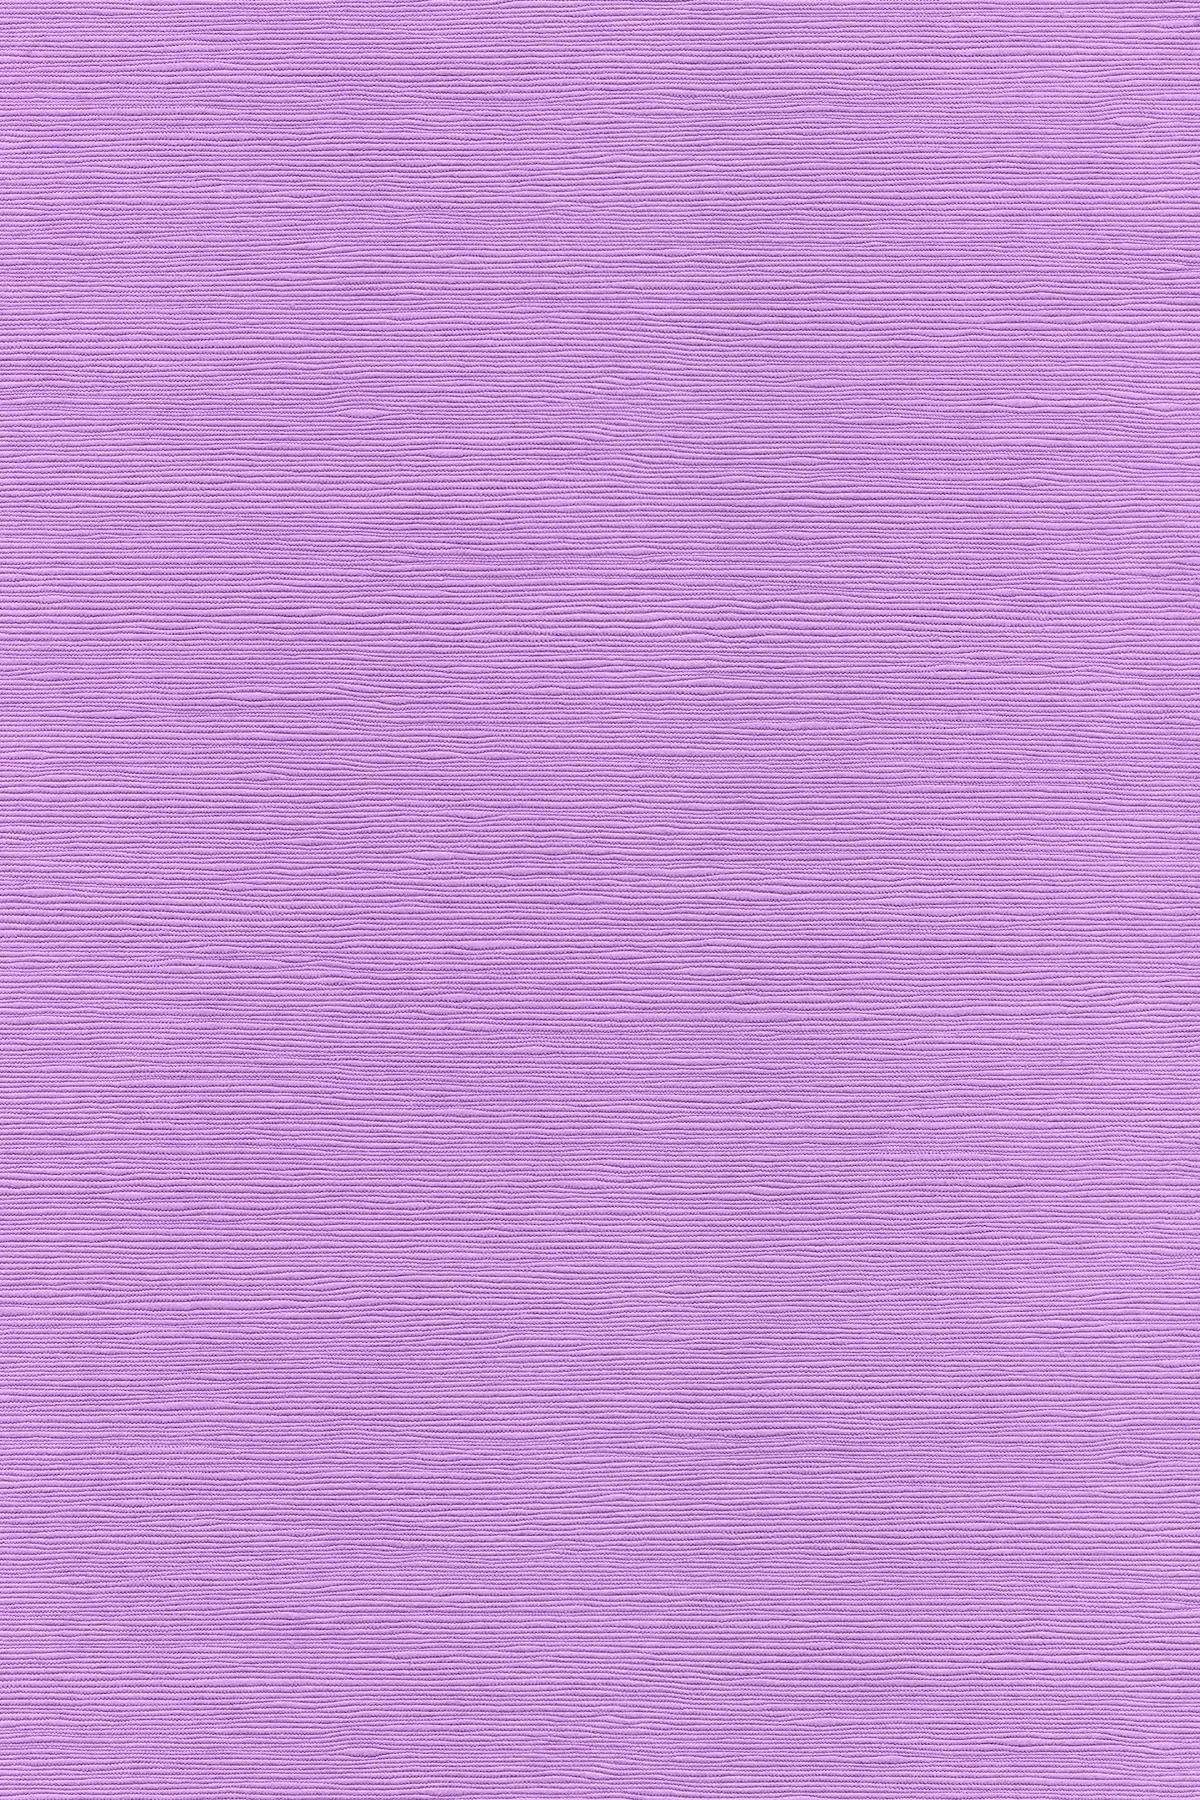 Japanese linen paper - violet photo